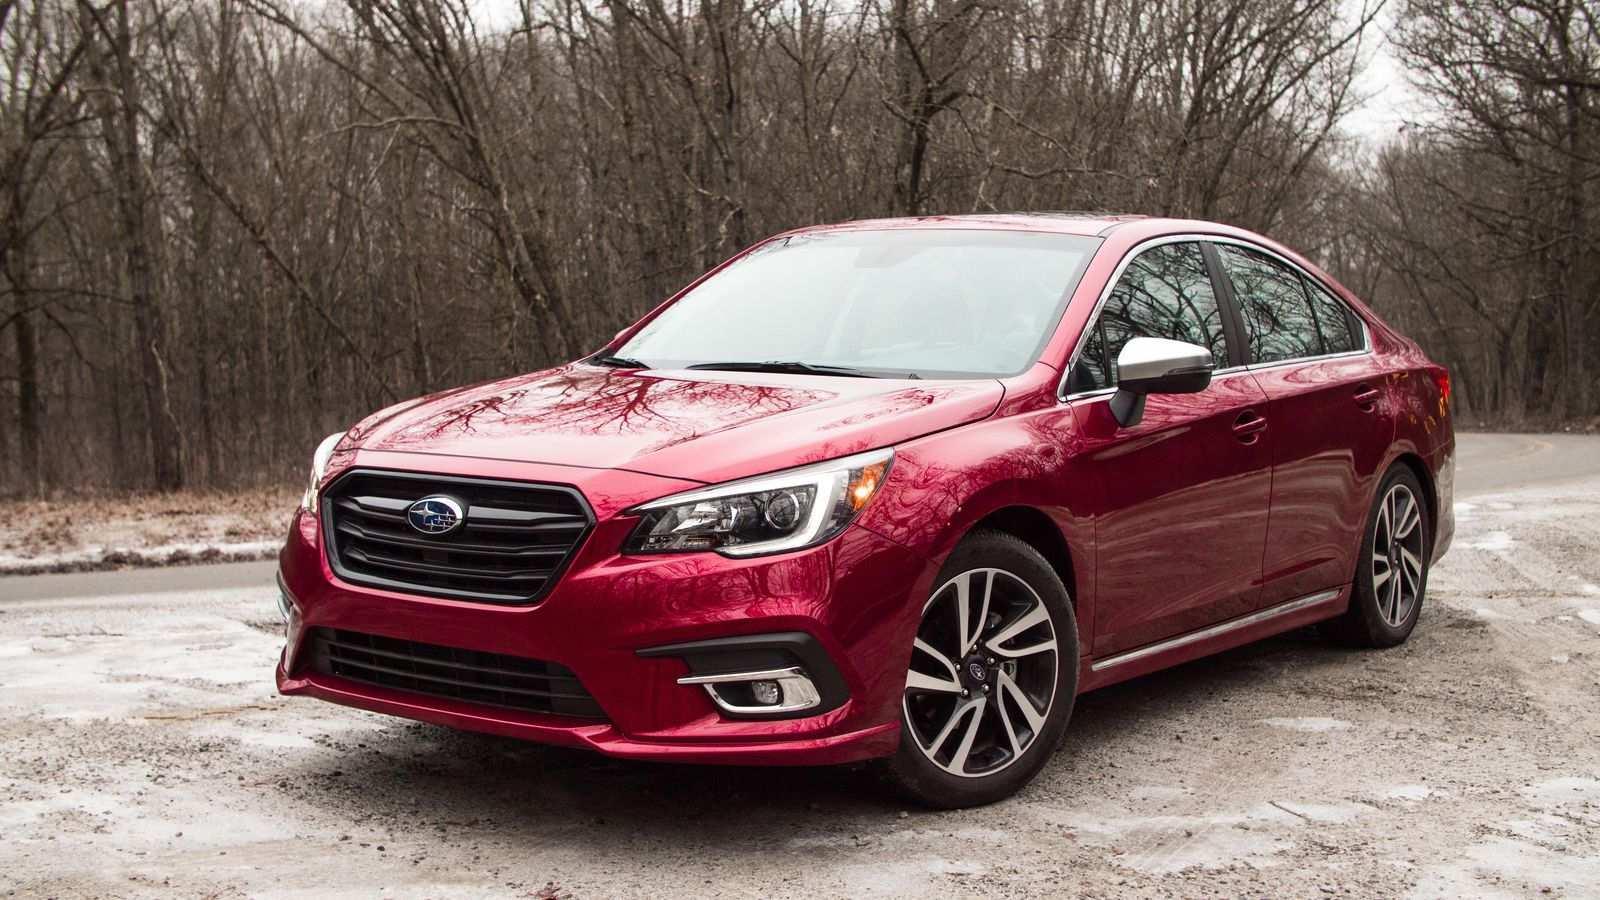 52 Best Review Subaru Eyesight 2019 Interior for Subaru Eyesight 2019